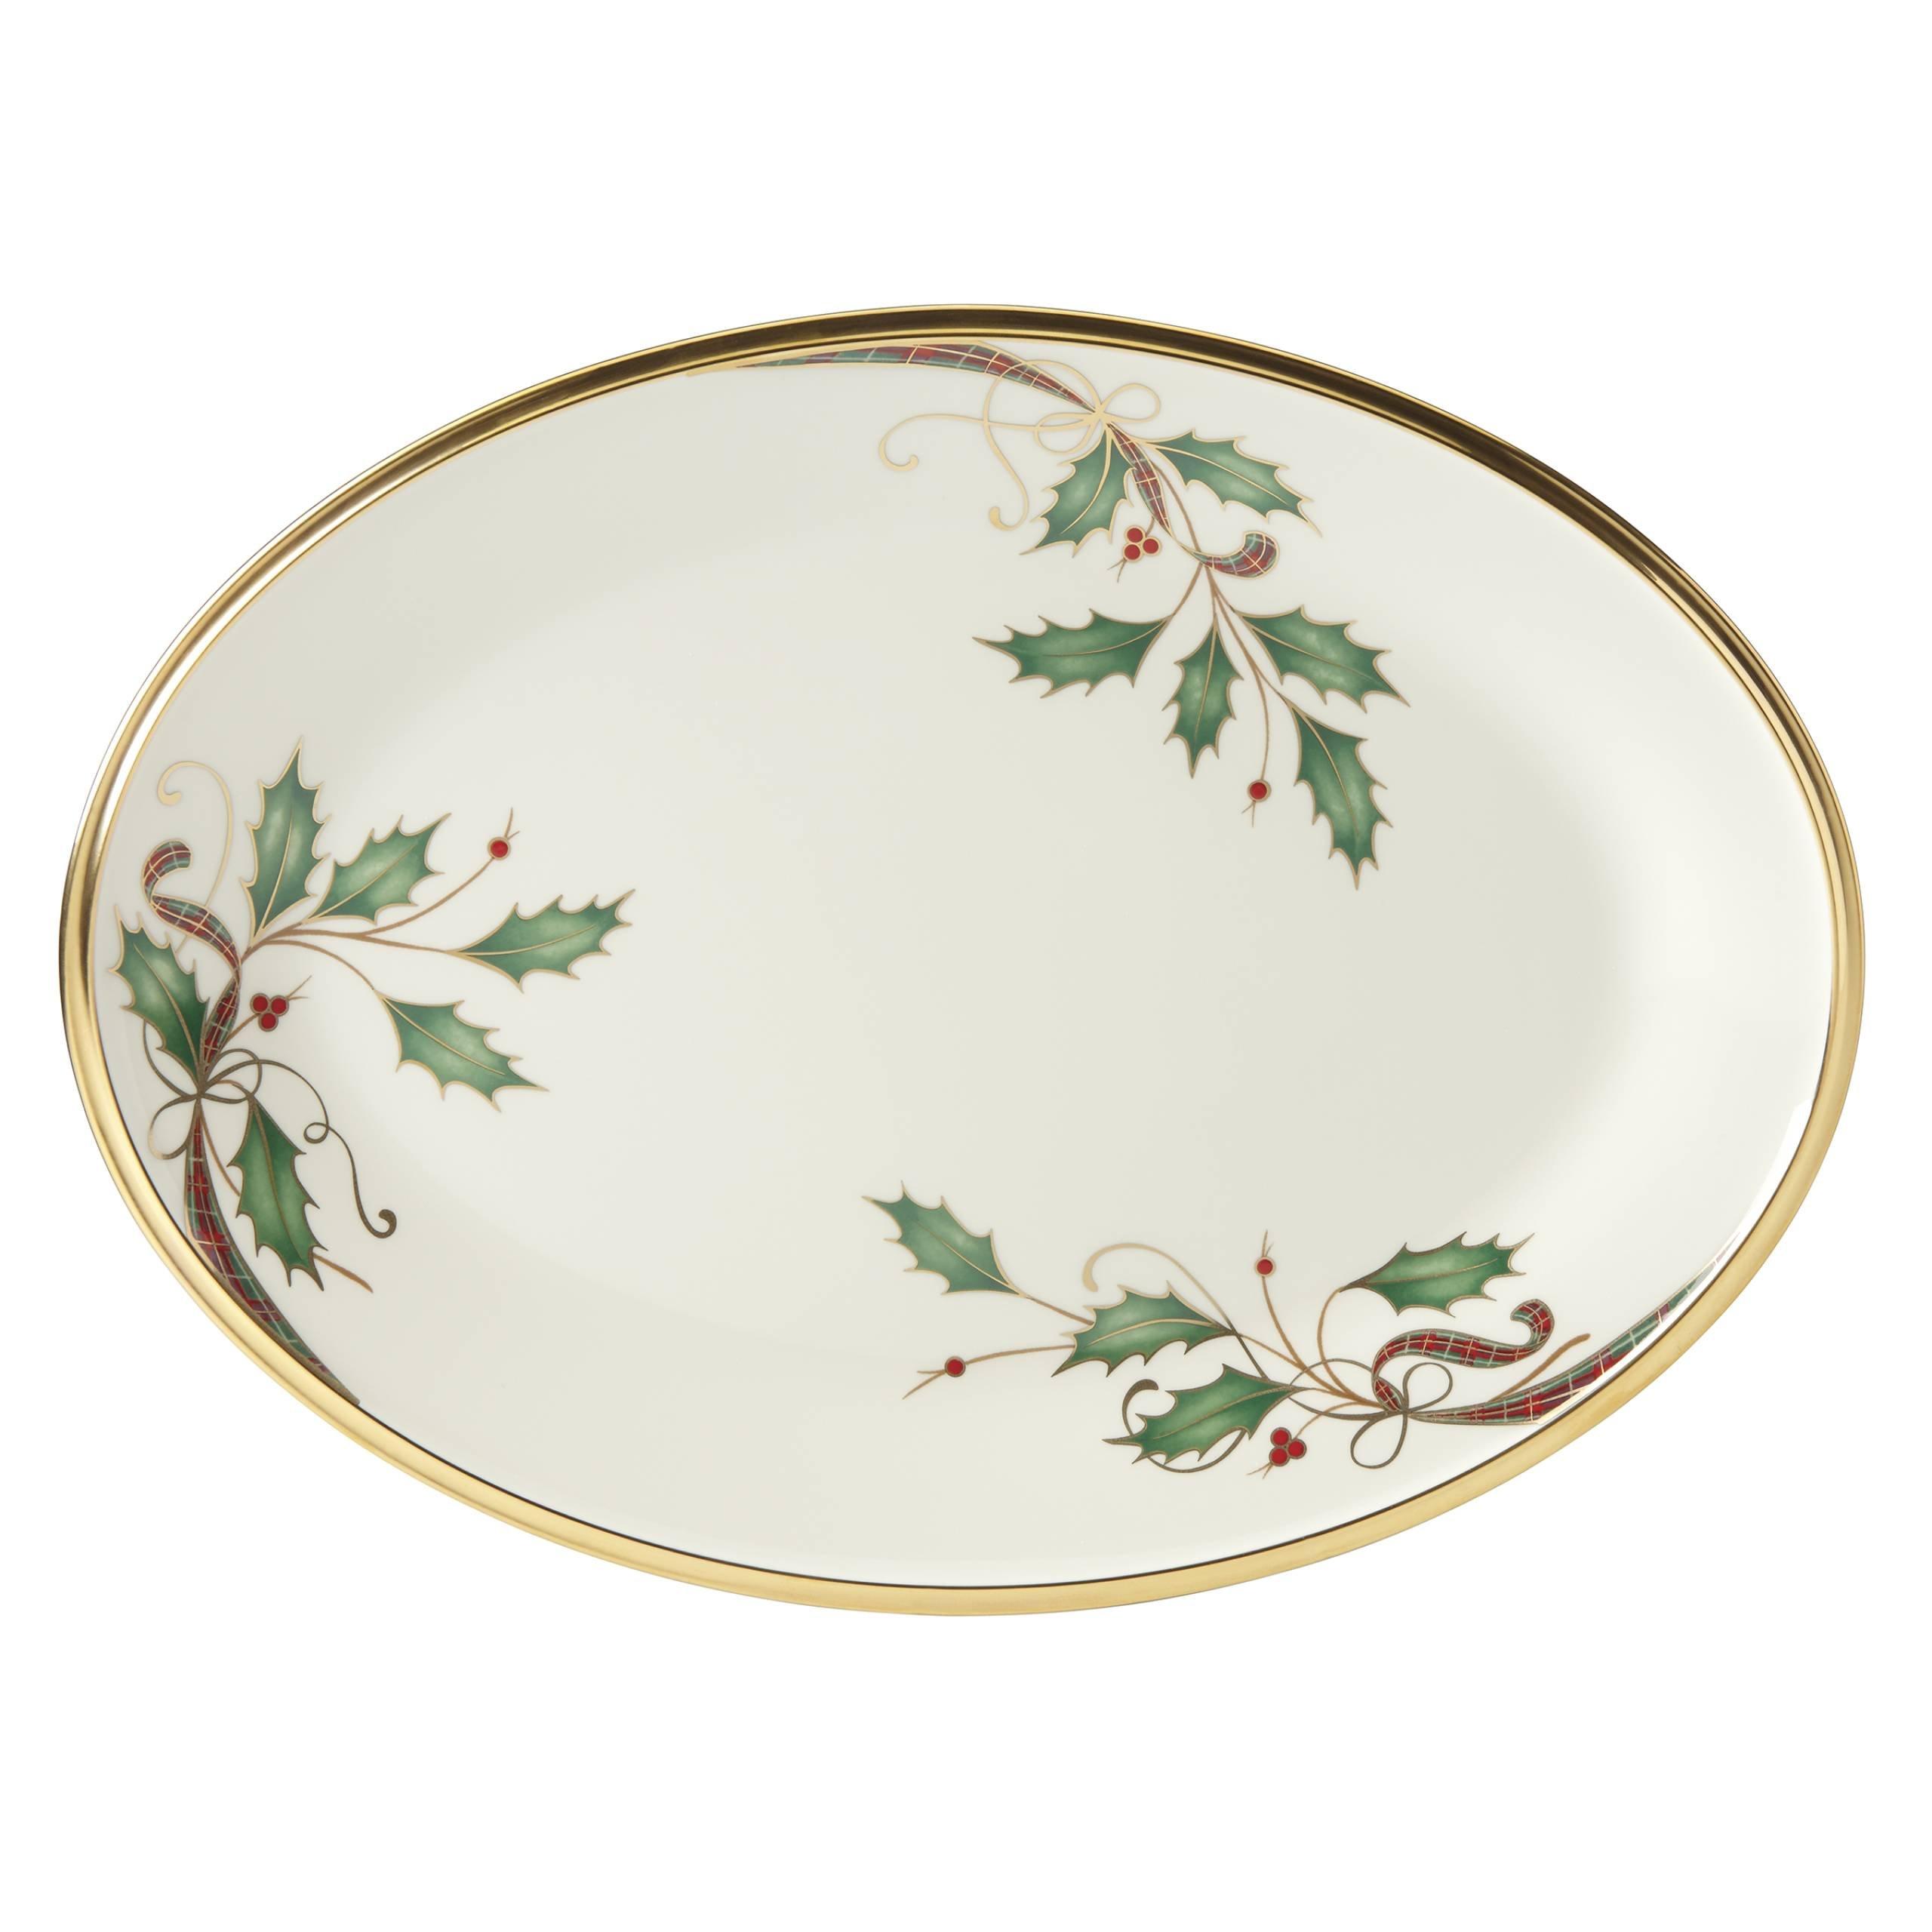 Lenox Holiday Nouveau Gold Oval Platter by Lenox (Image #1)